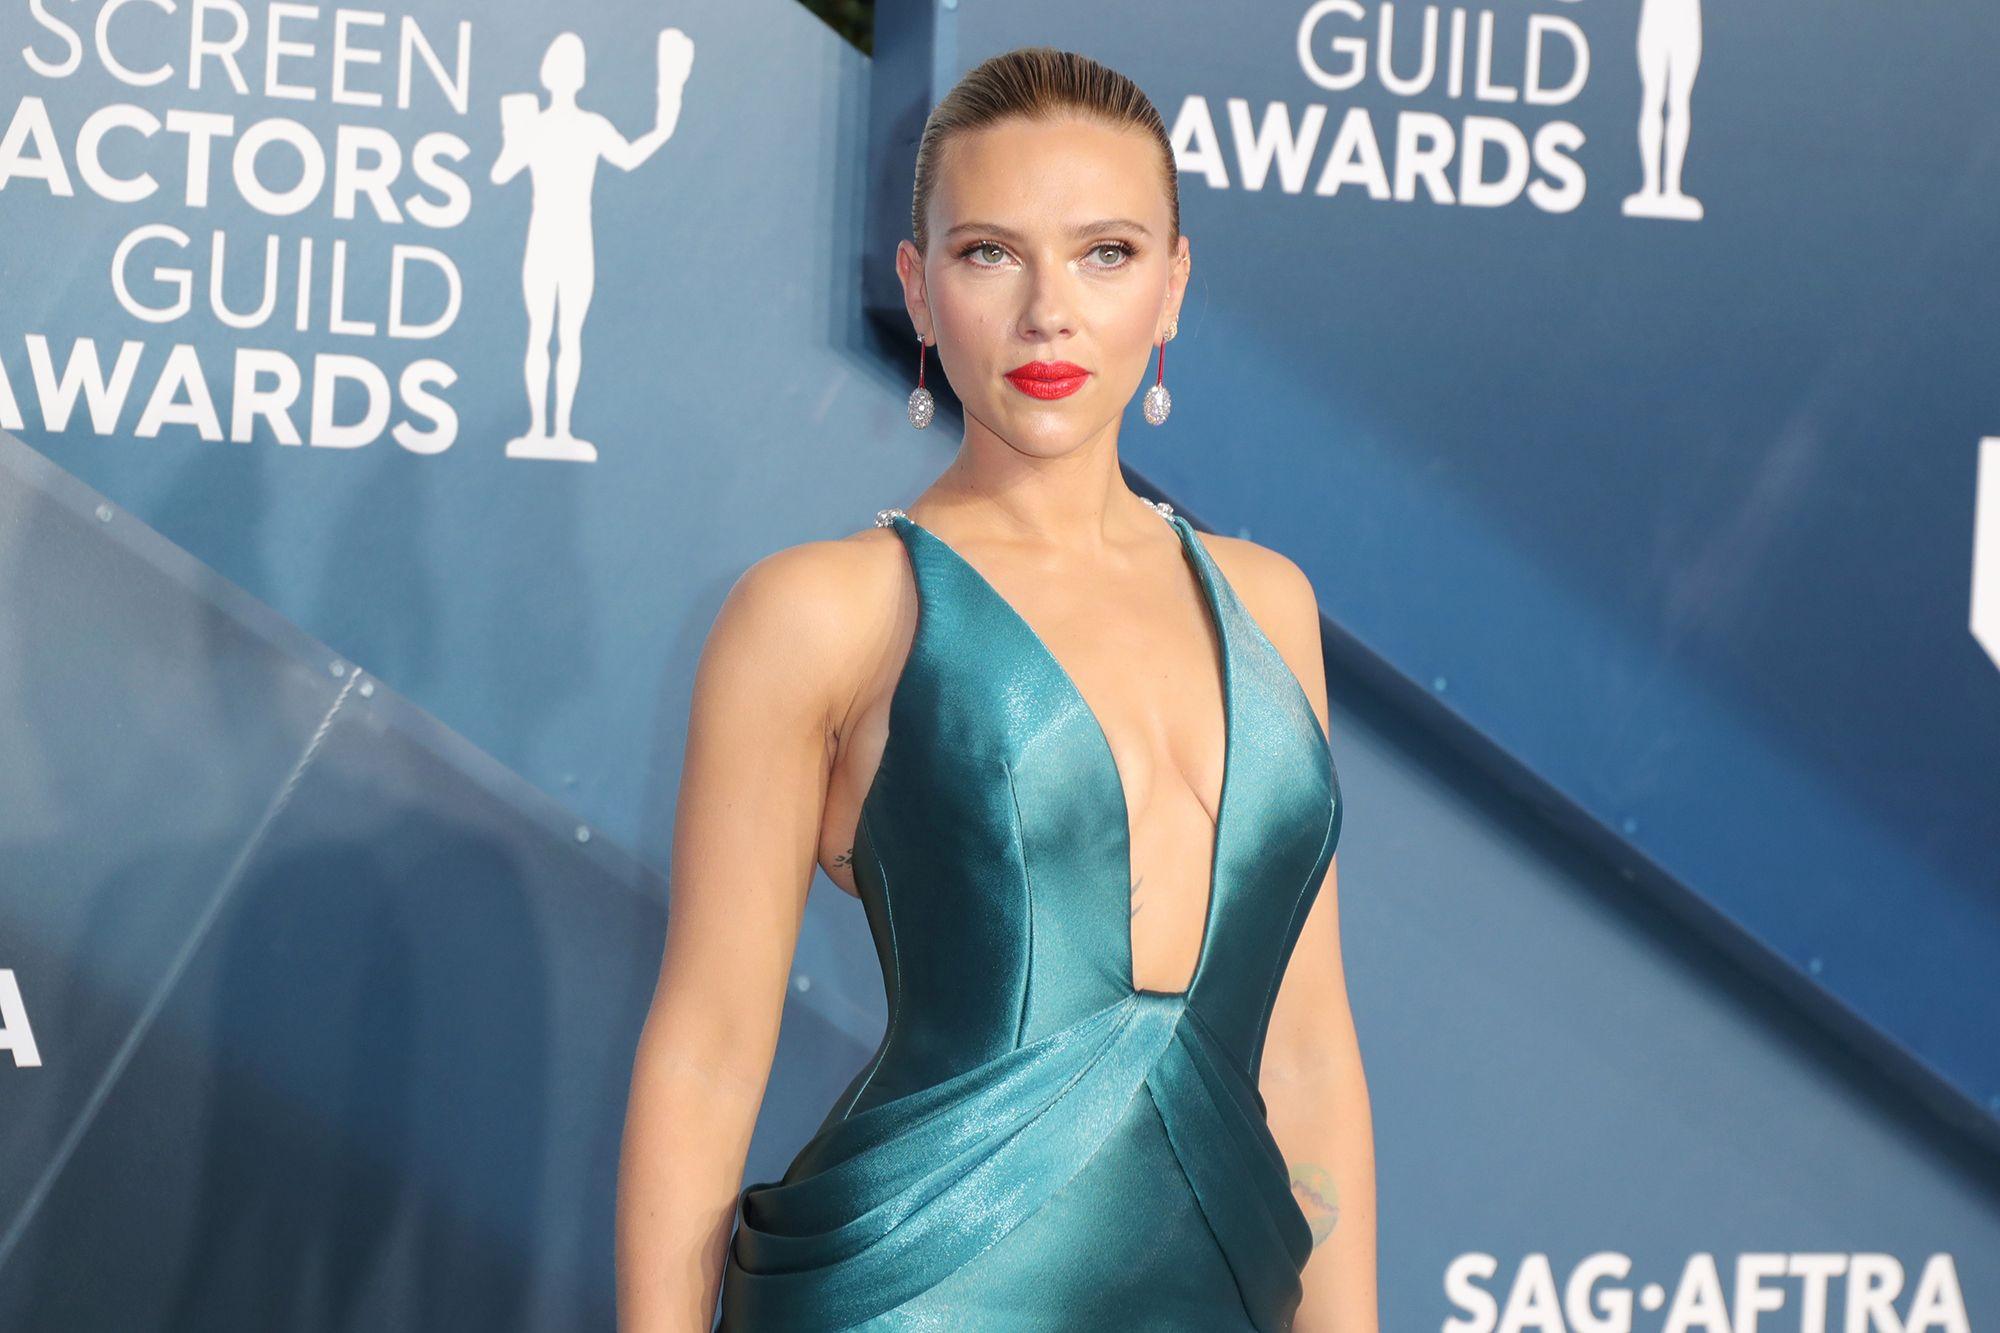 Scarlett Johansson plans to launch her own beauty brand in 2022